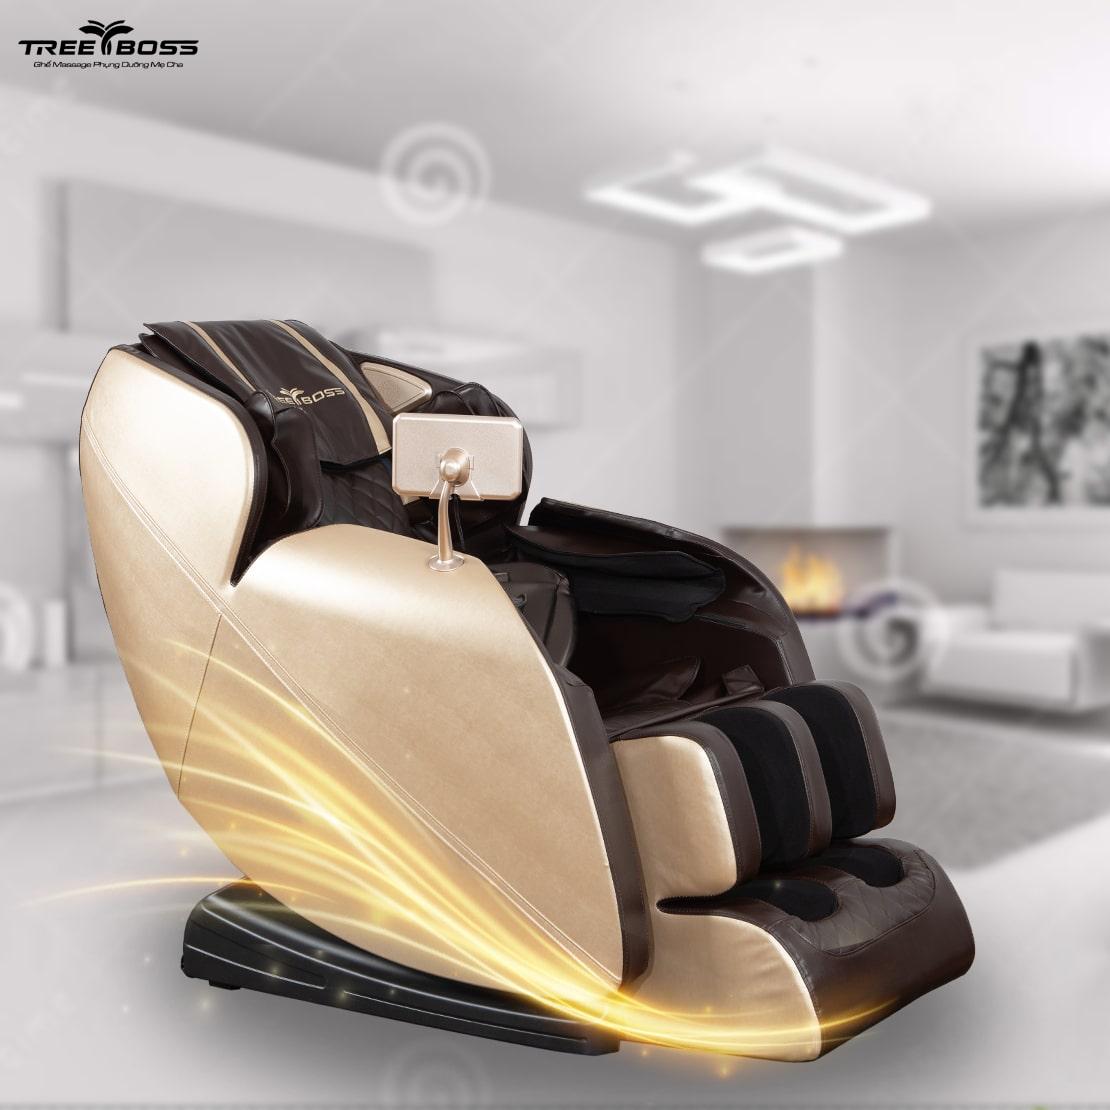 ghế massage dưới 40 triệu